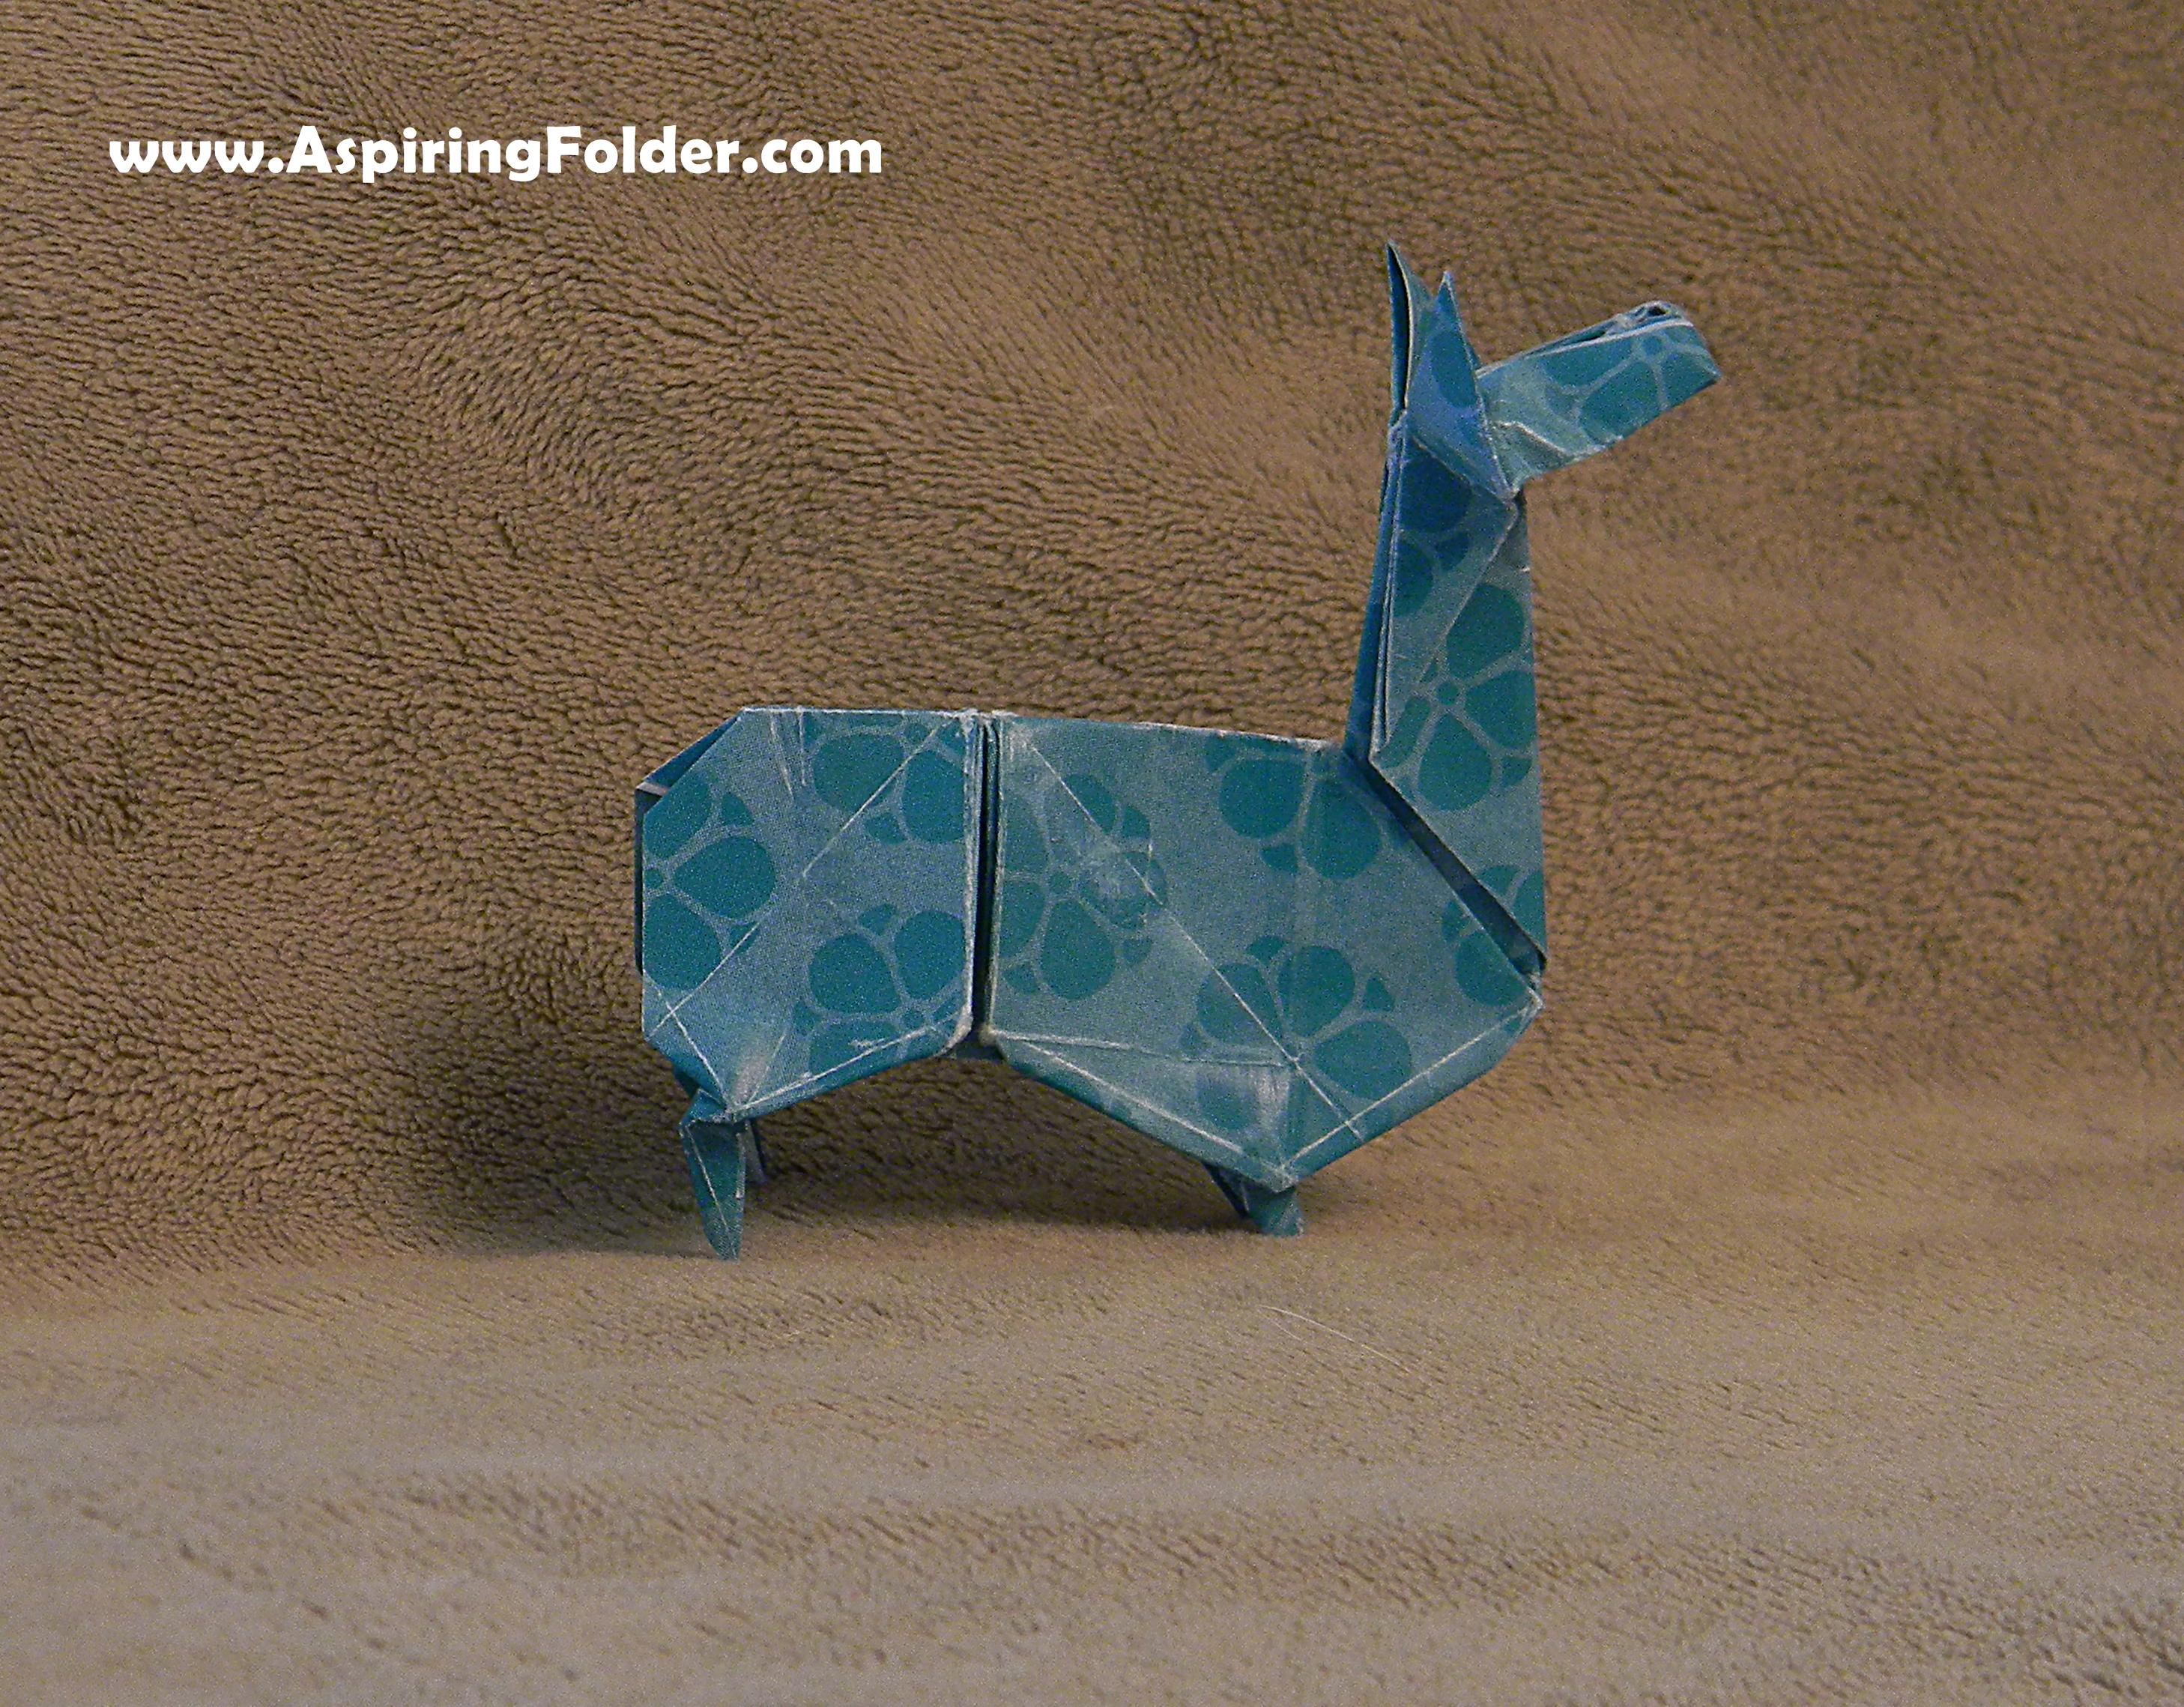 Origami Llama Aspiring Folder